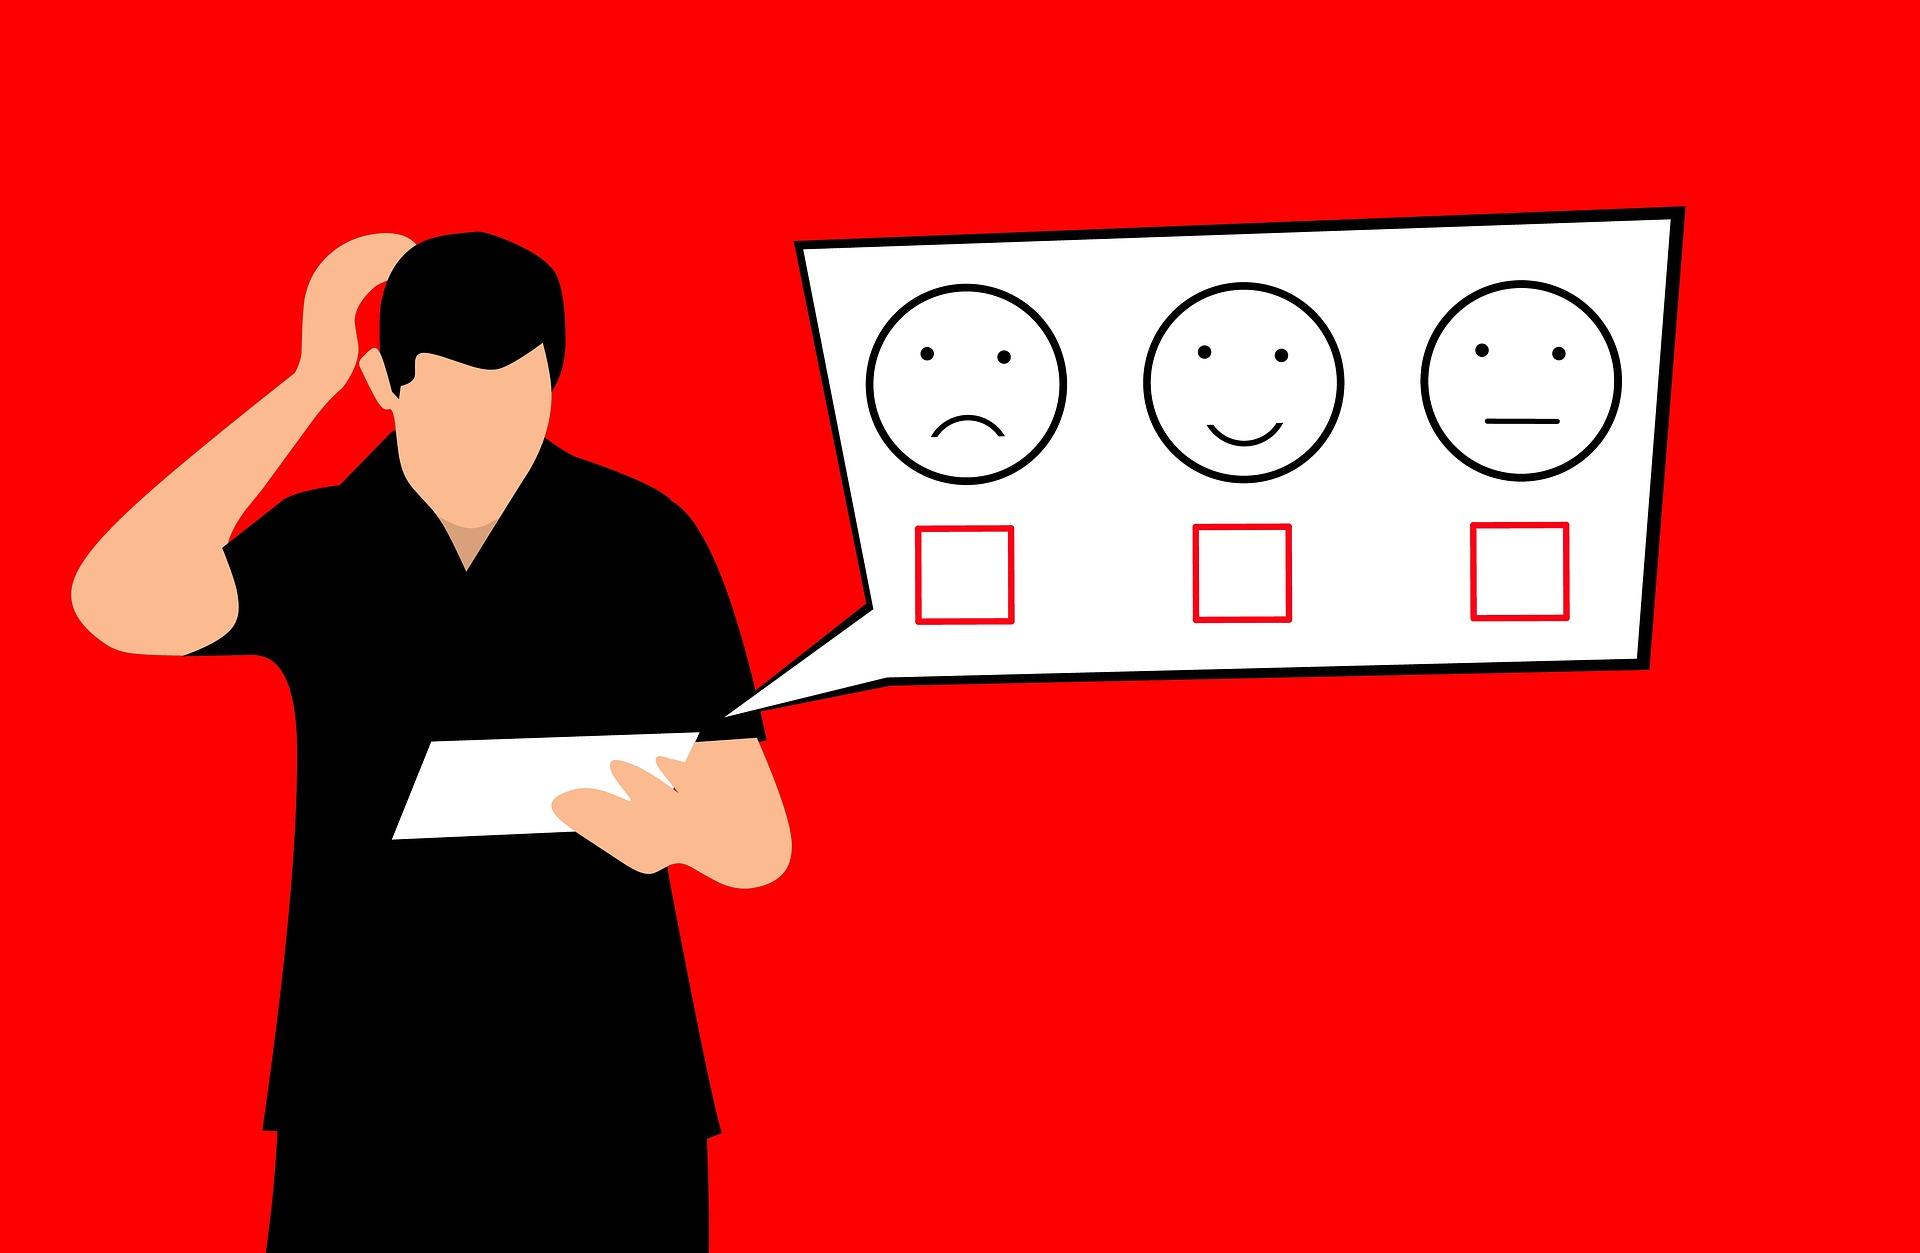 The Kroger Reviewer Evaluation Part-Time Job Scam